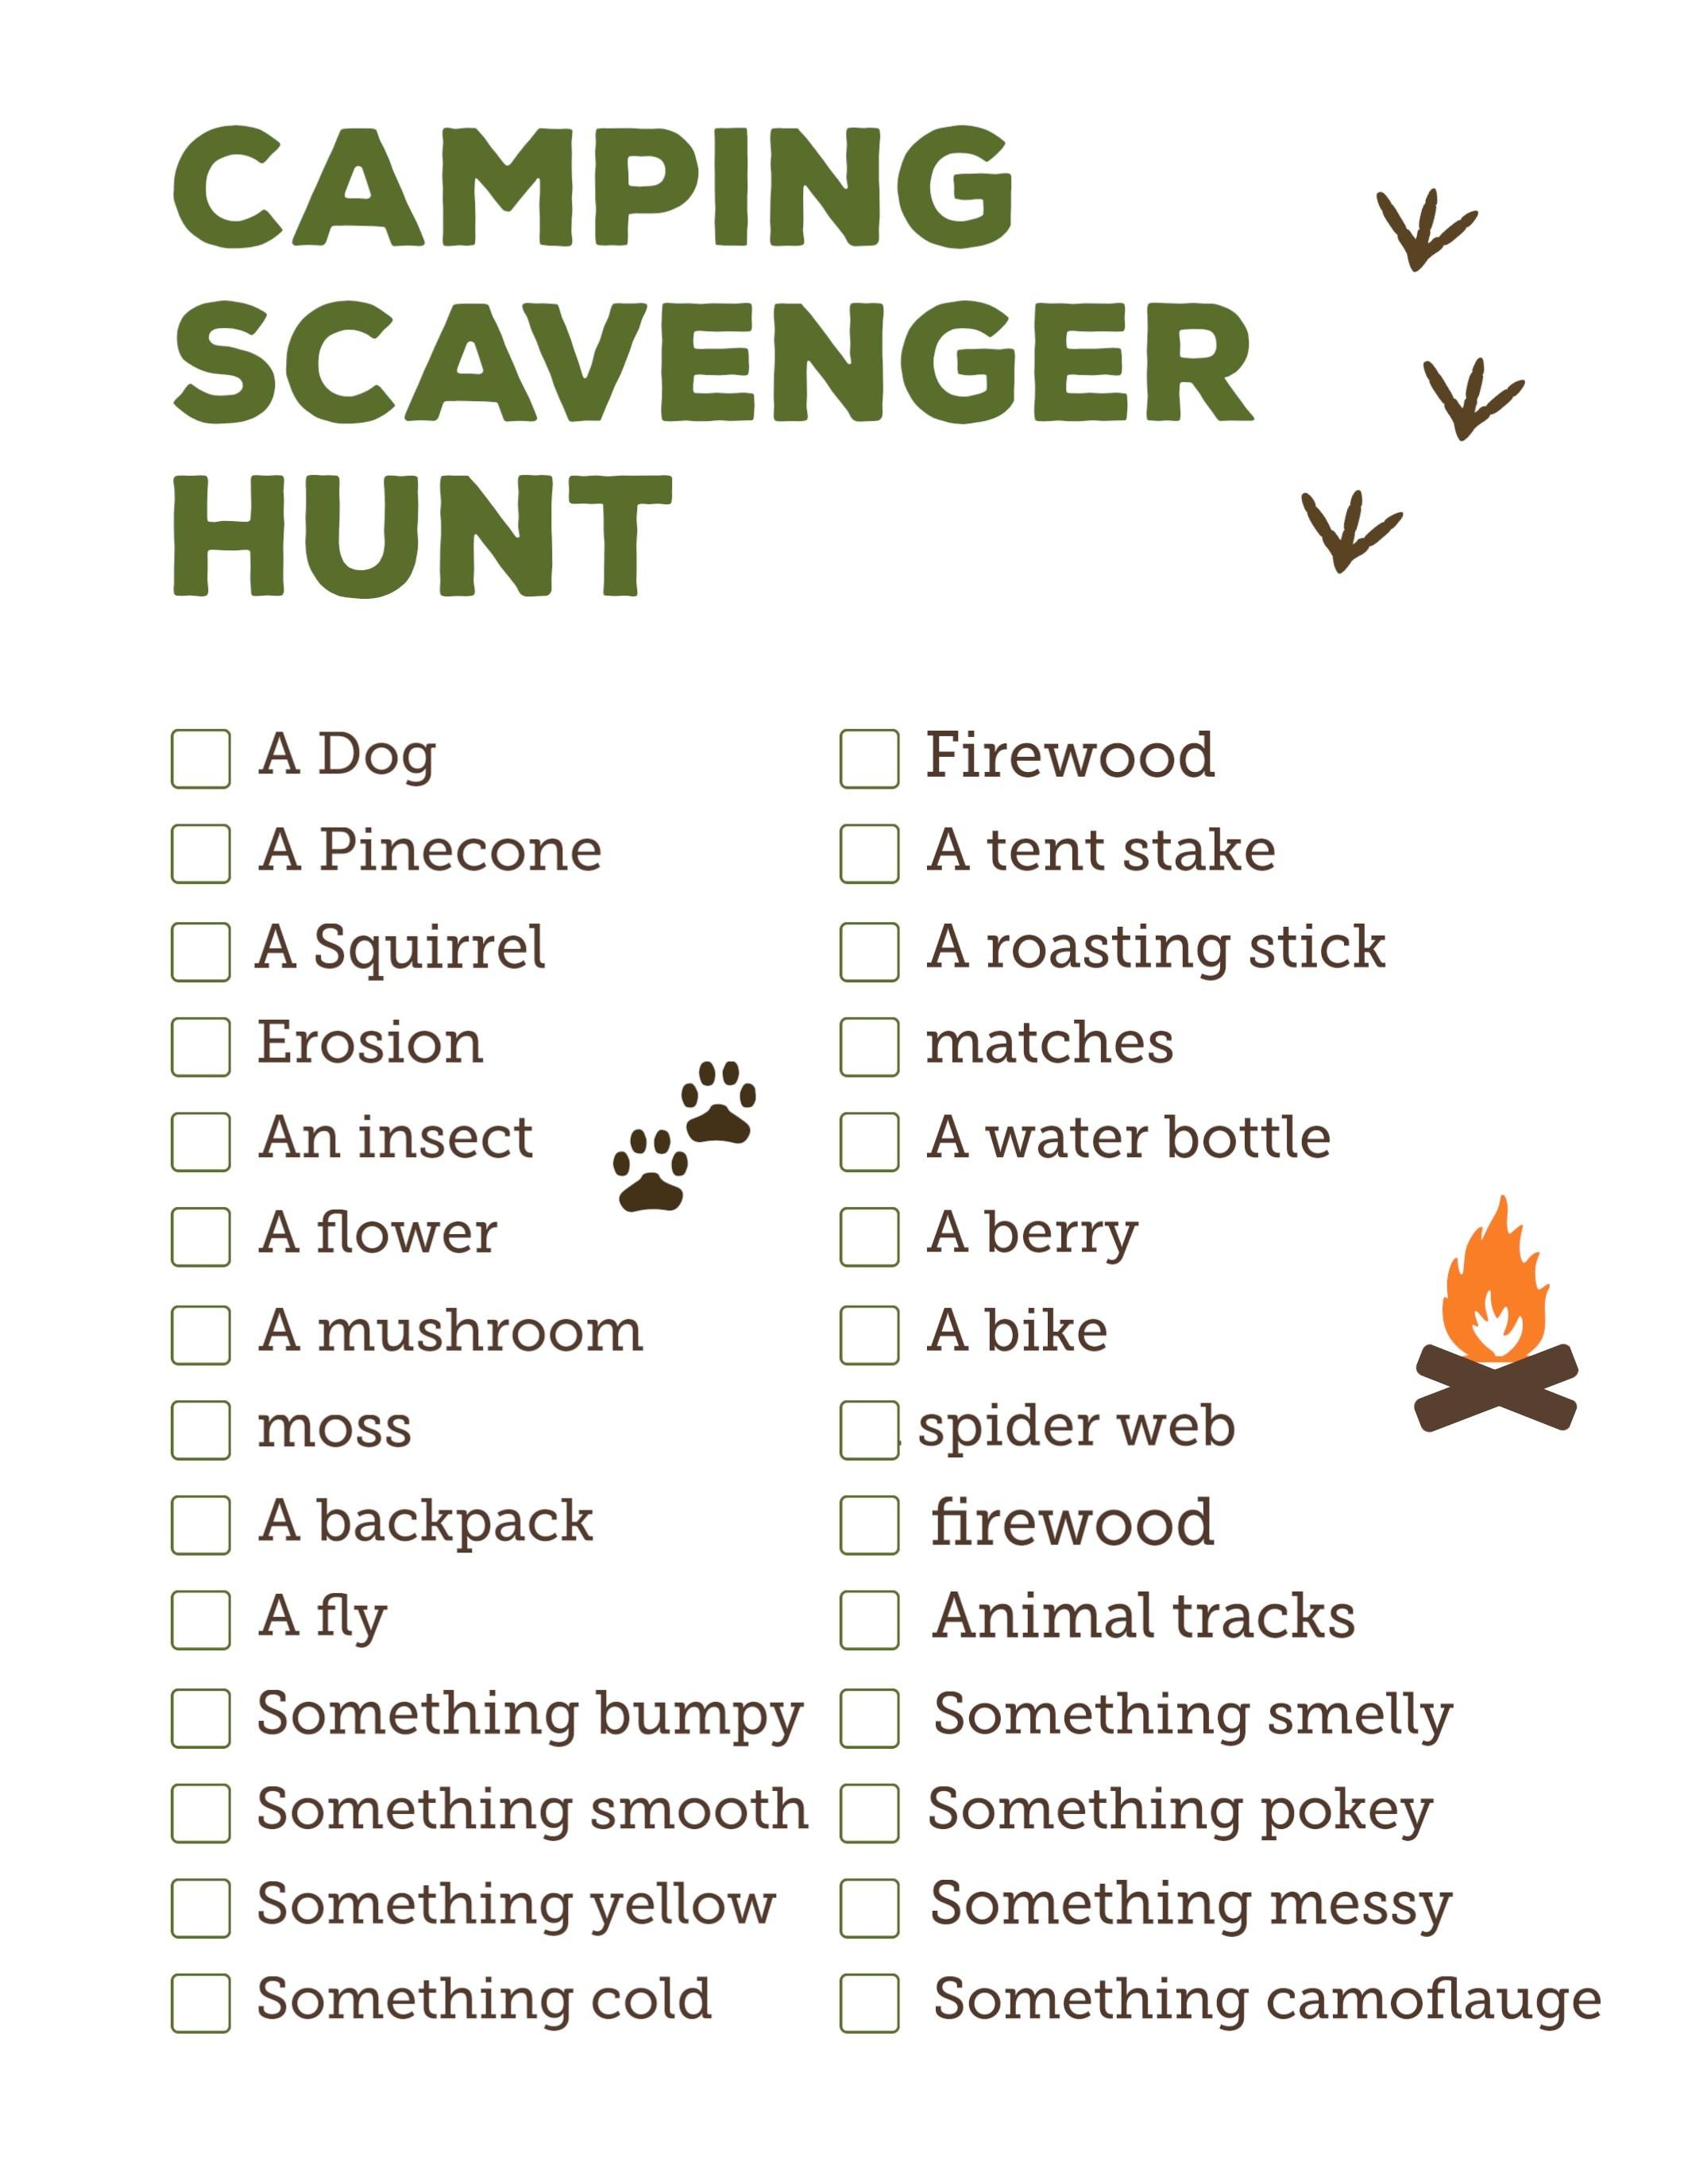 Camping Scavenger Hunt Printable - Paper Trail Design - Free Printable Scavenger Hunt